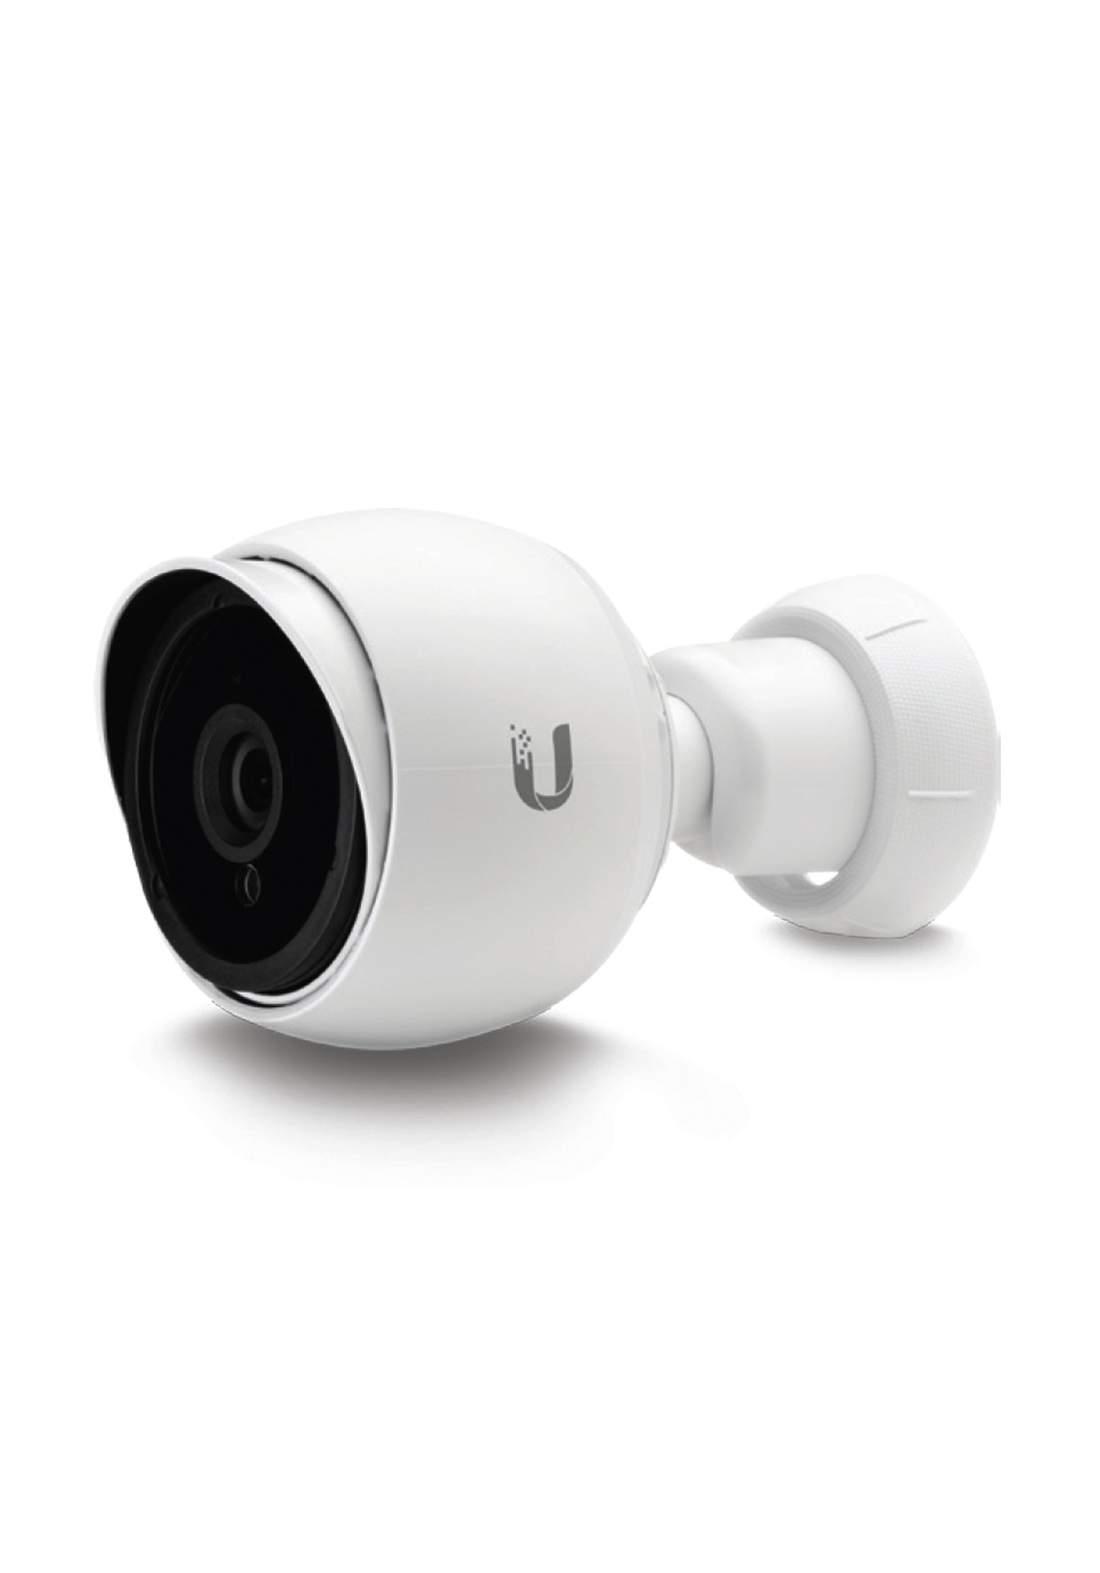 Ubiquit UVC-G3-5 Bullet Video Camera - White كاميرا